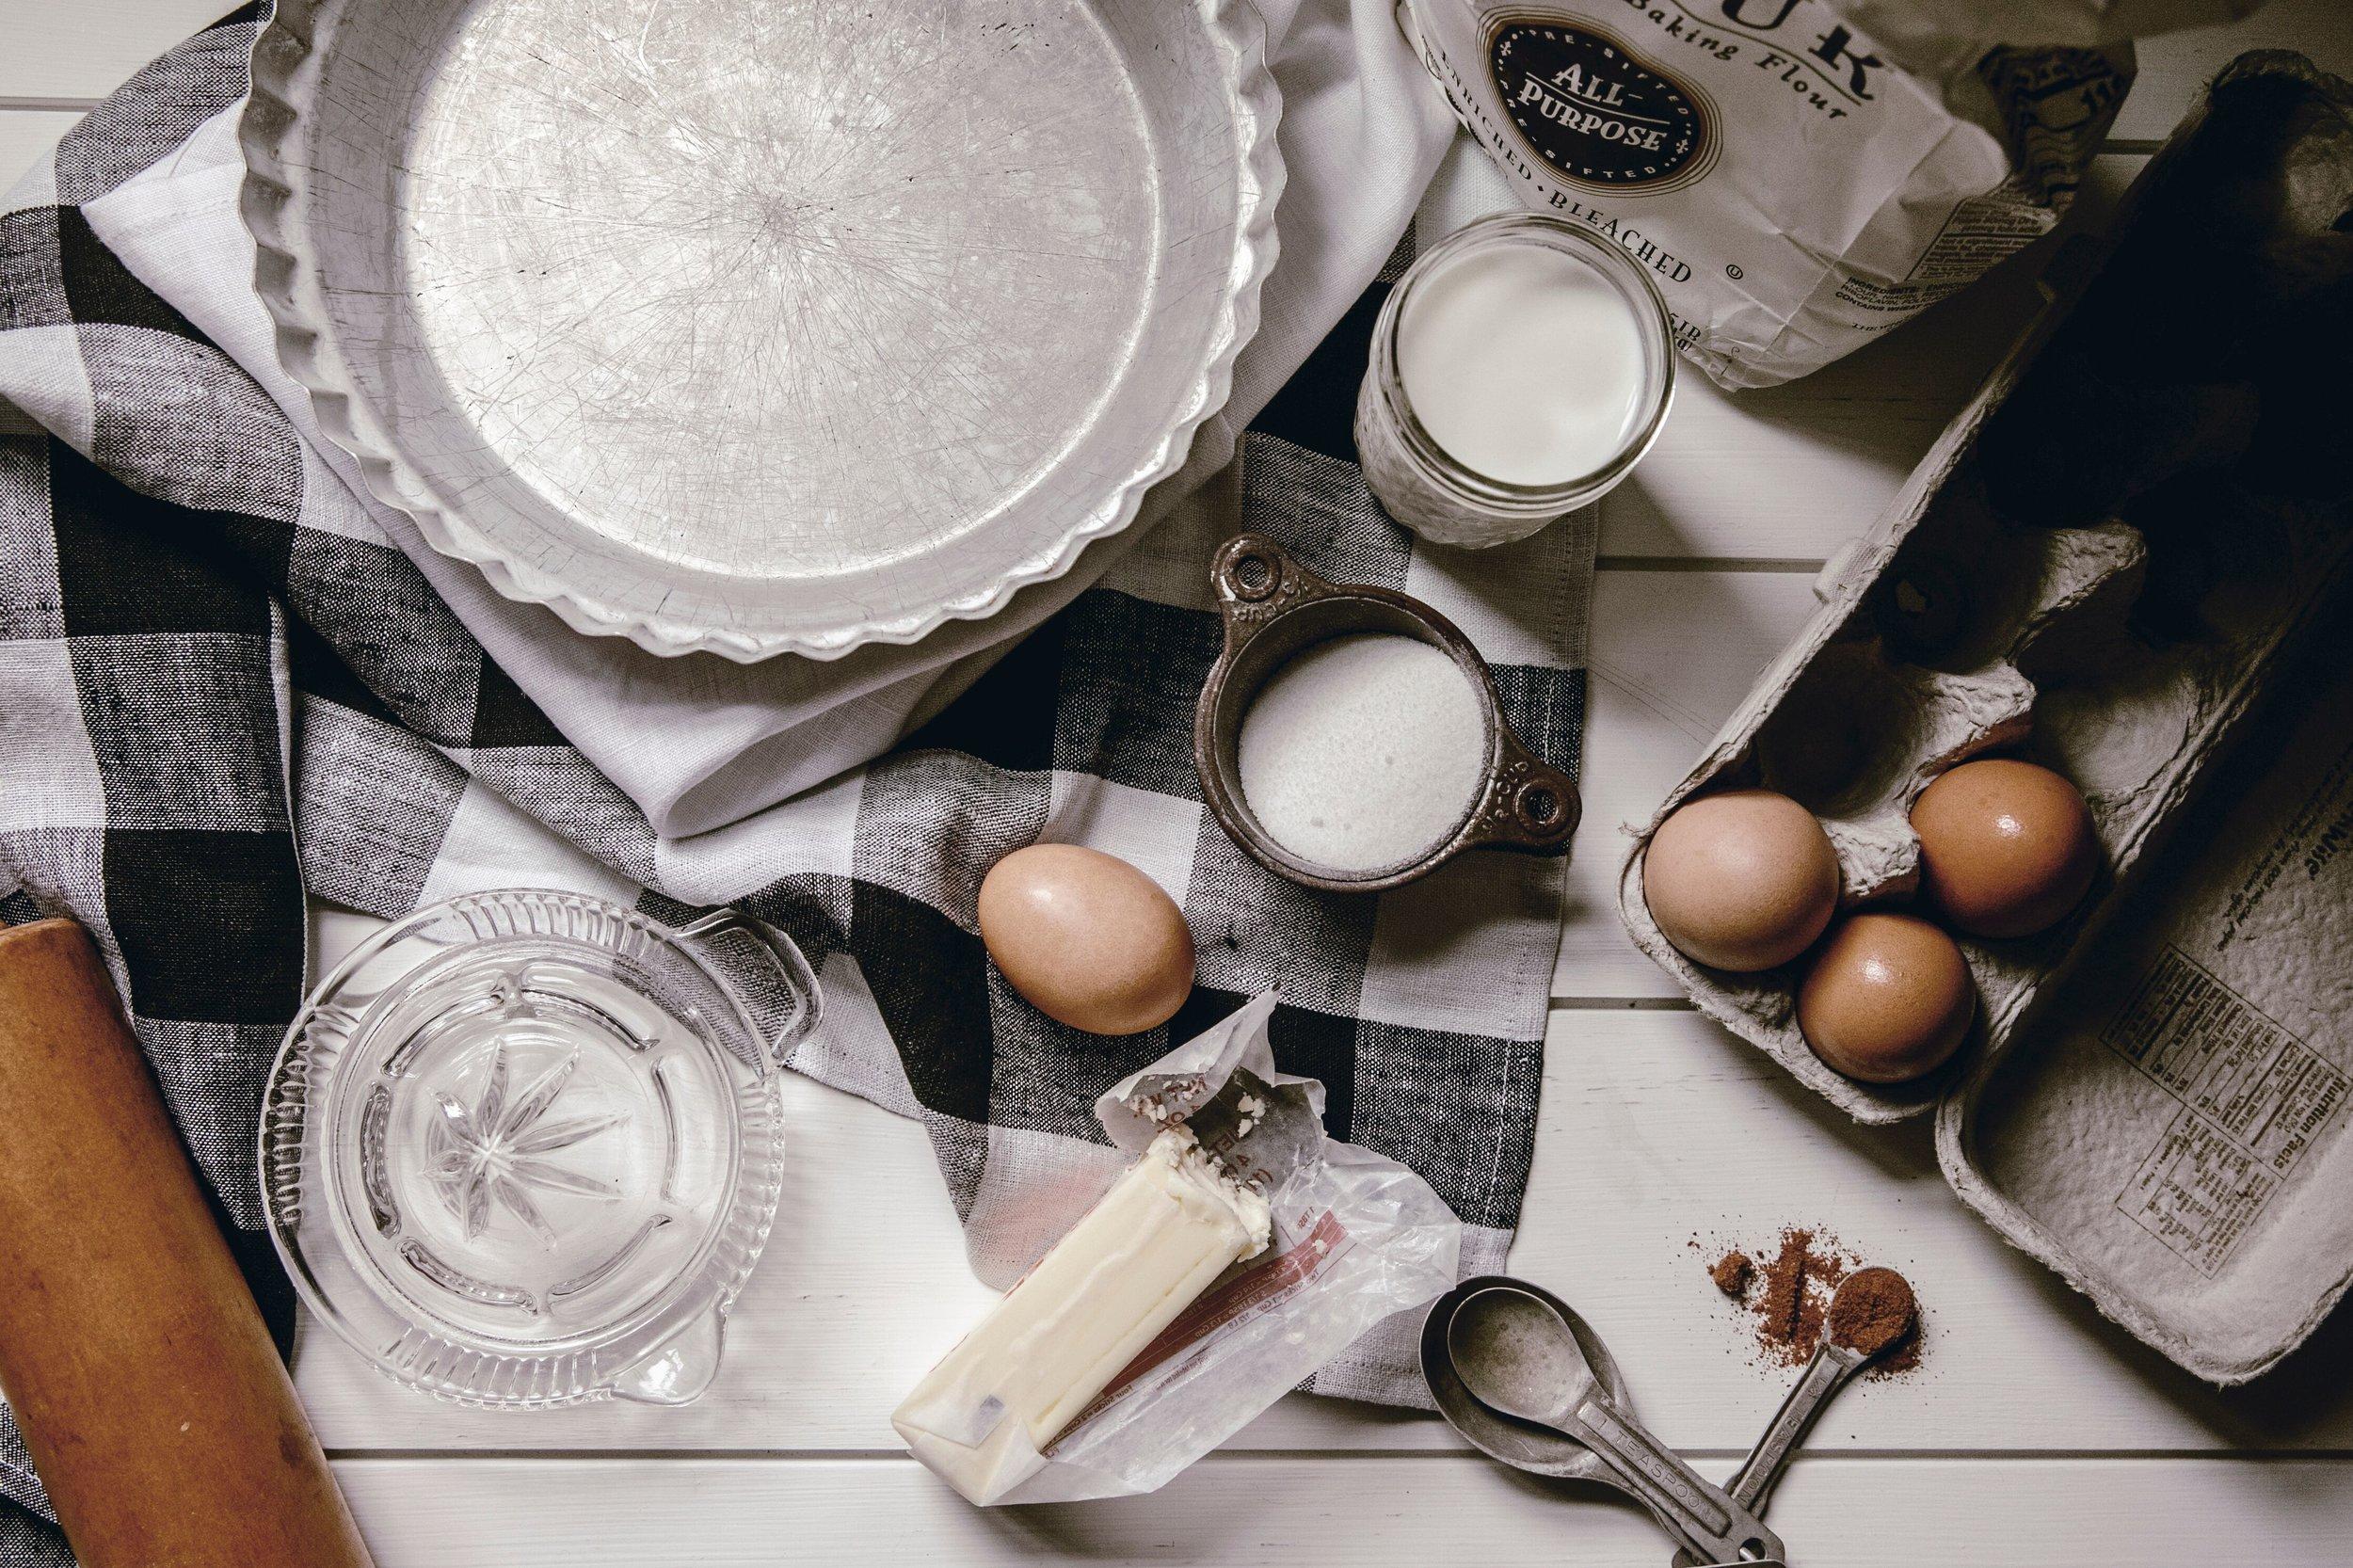 buttermilk pie ingredients by heirloomed